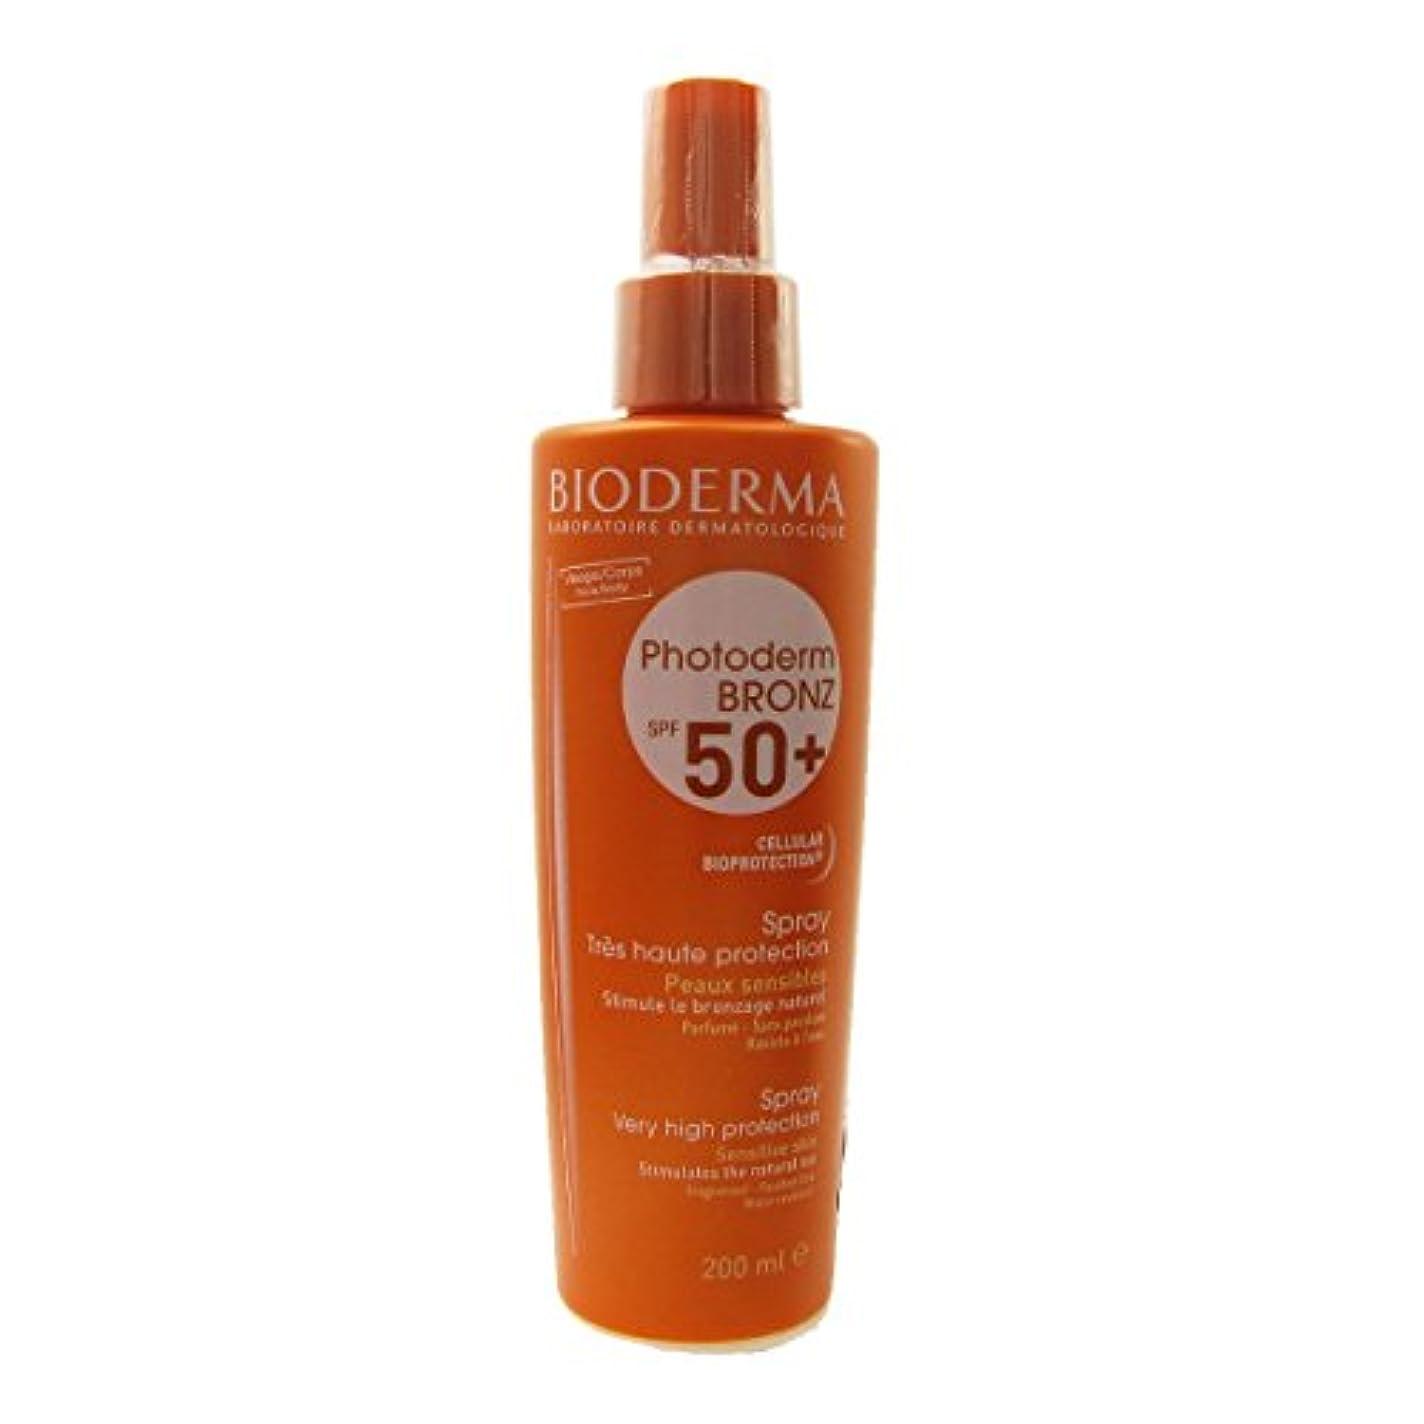 合金住人ブレースBioderma Photoderm Bronz Spf 50 Spray 200ml [並行輸入品]